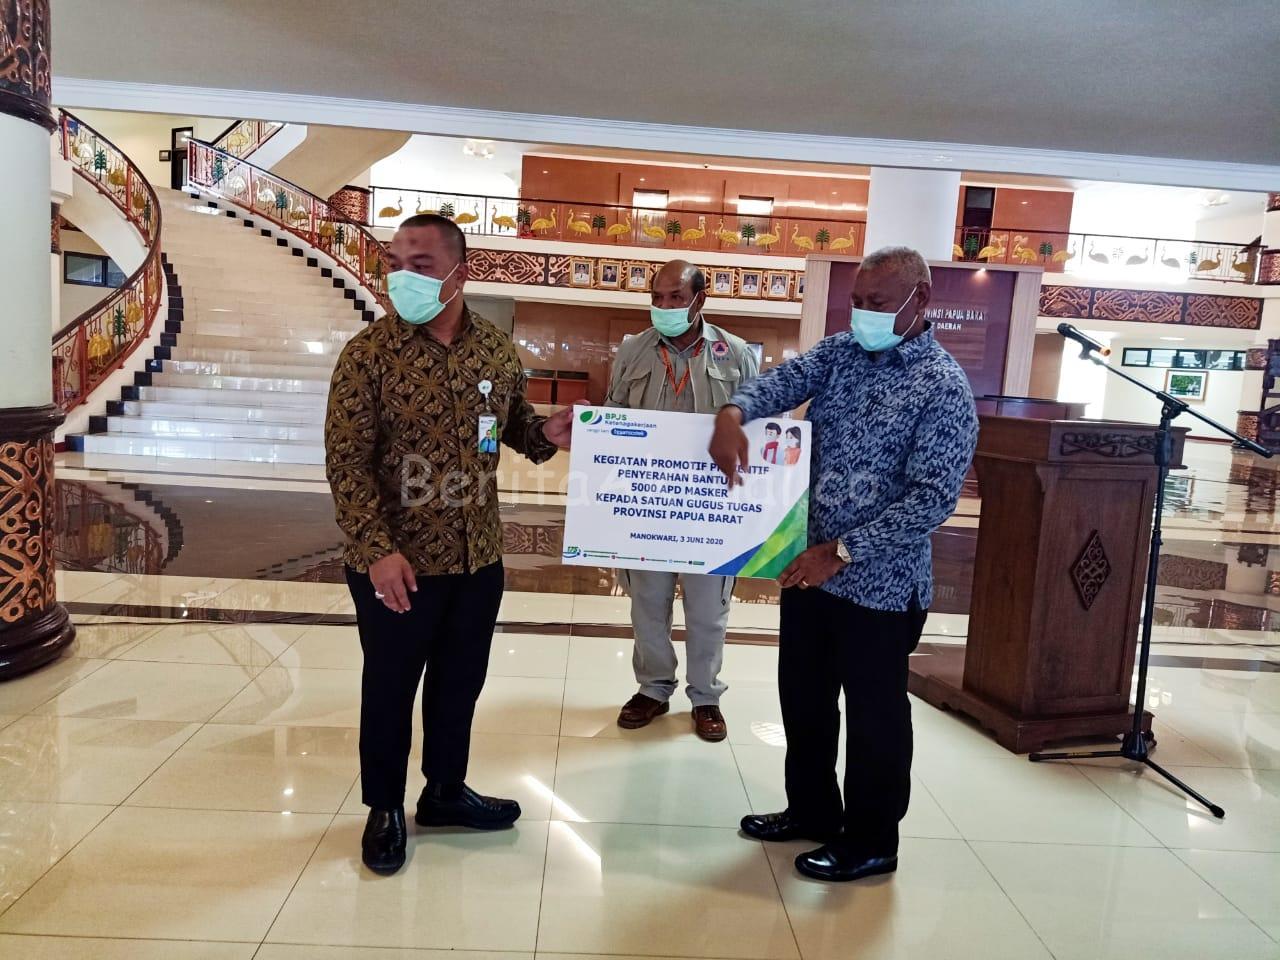 Gubernur Papua Barat Terima Bantuan 5000 Masker Dari BPJS Ketenagakerjaan 16 IMG 20200604 WA0056